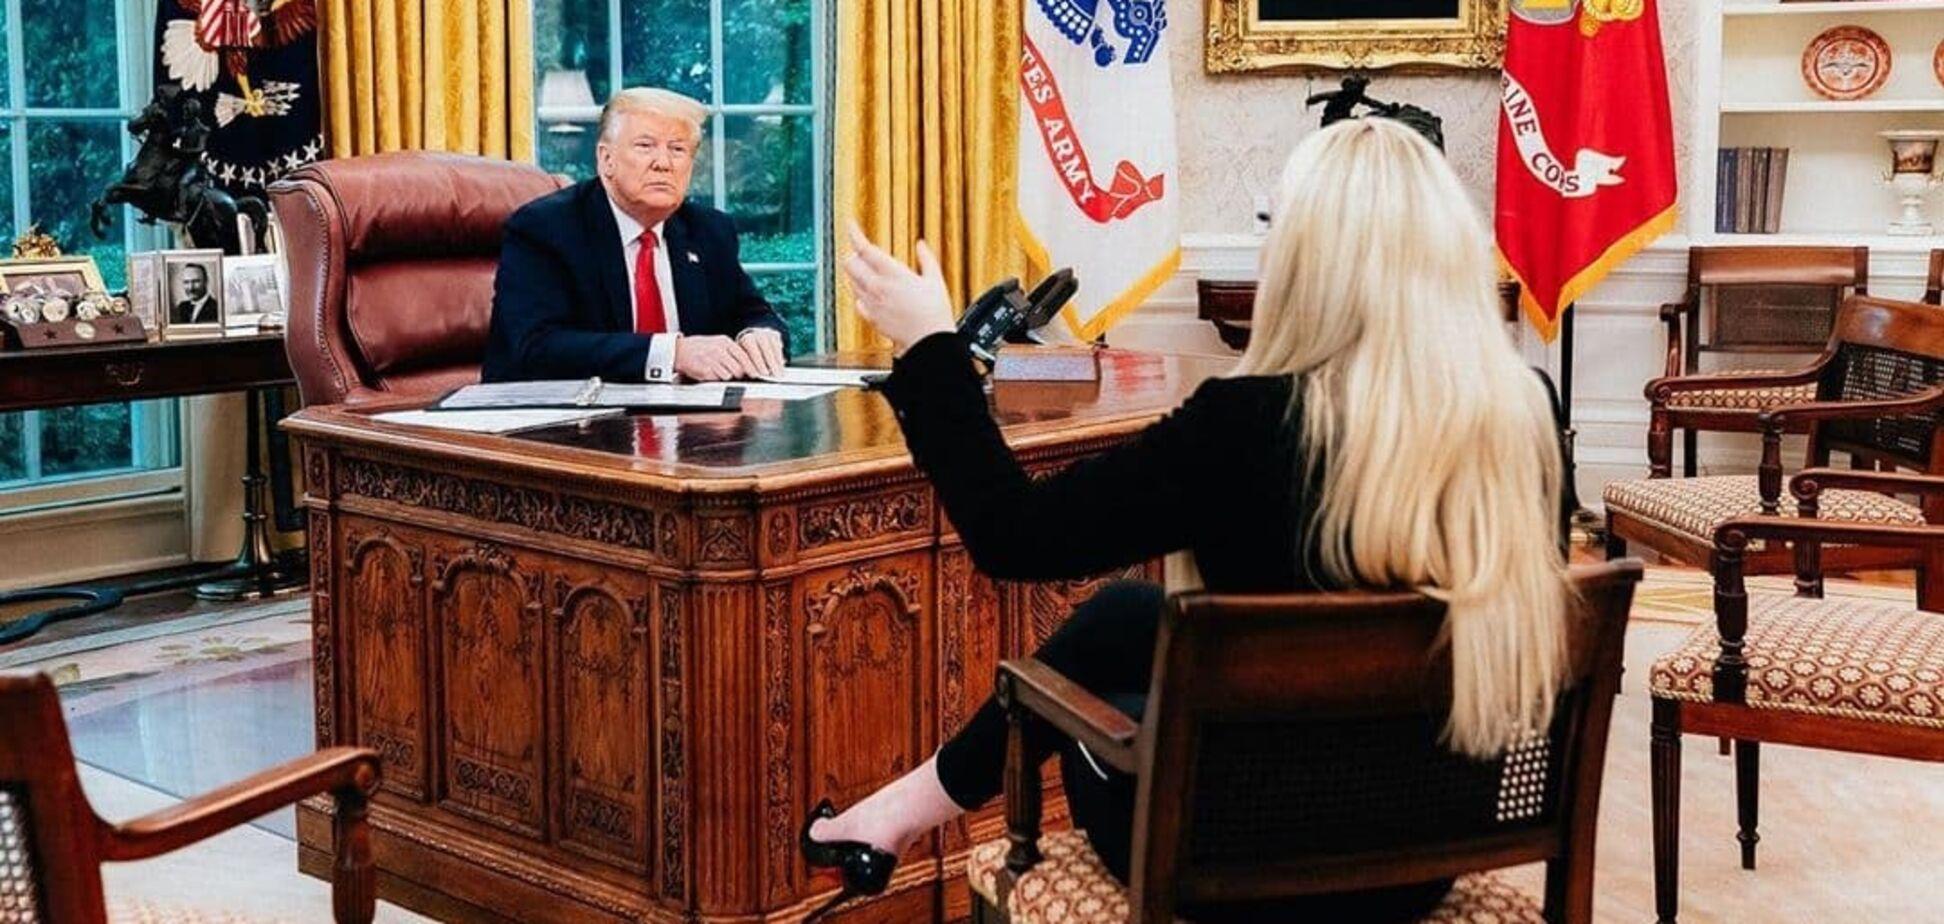 Дональд Трамп с дочерью Тиффани